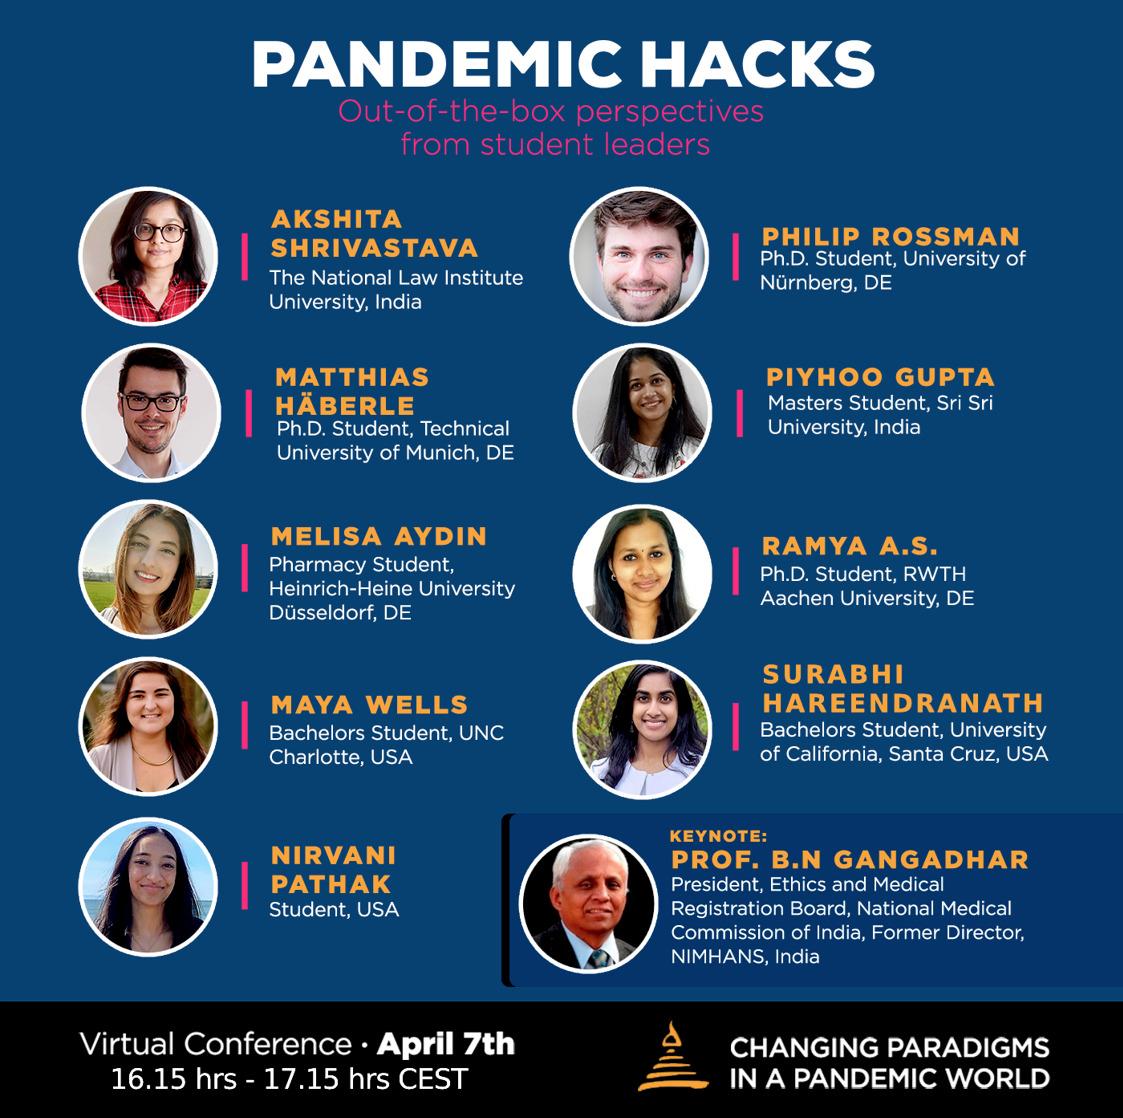 PANDEMIC HACKS Virtual Talk